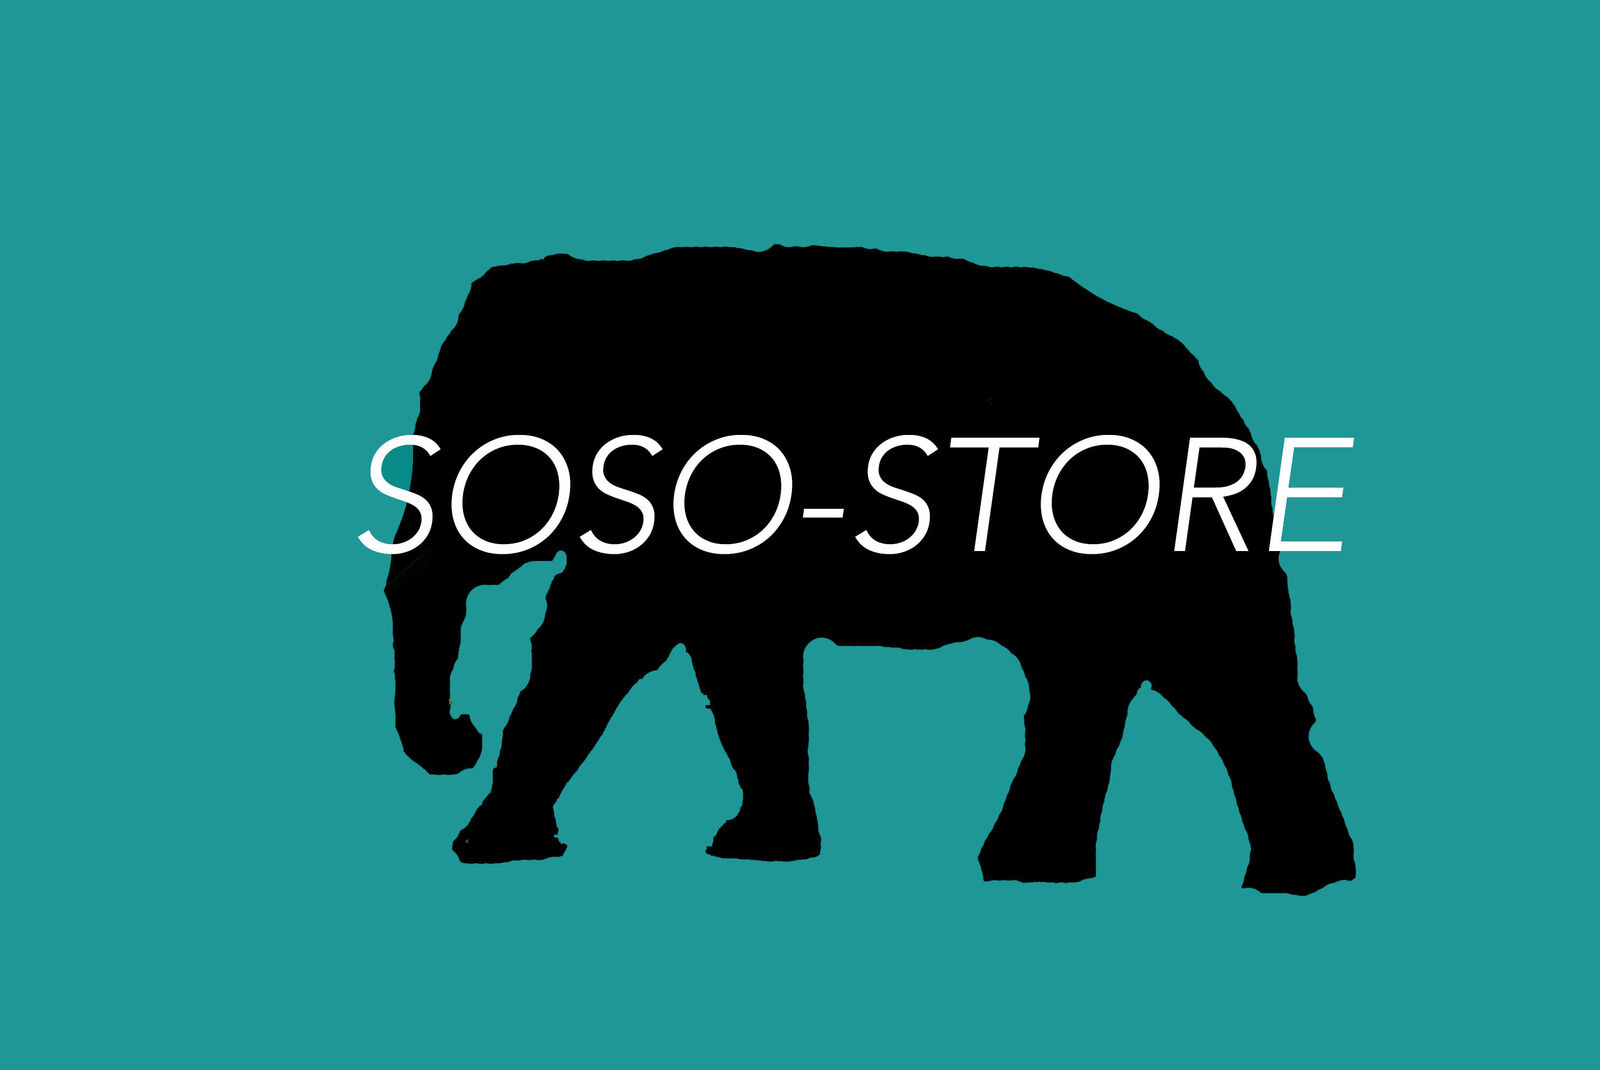 SOSO-STORE